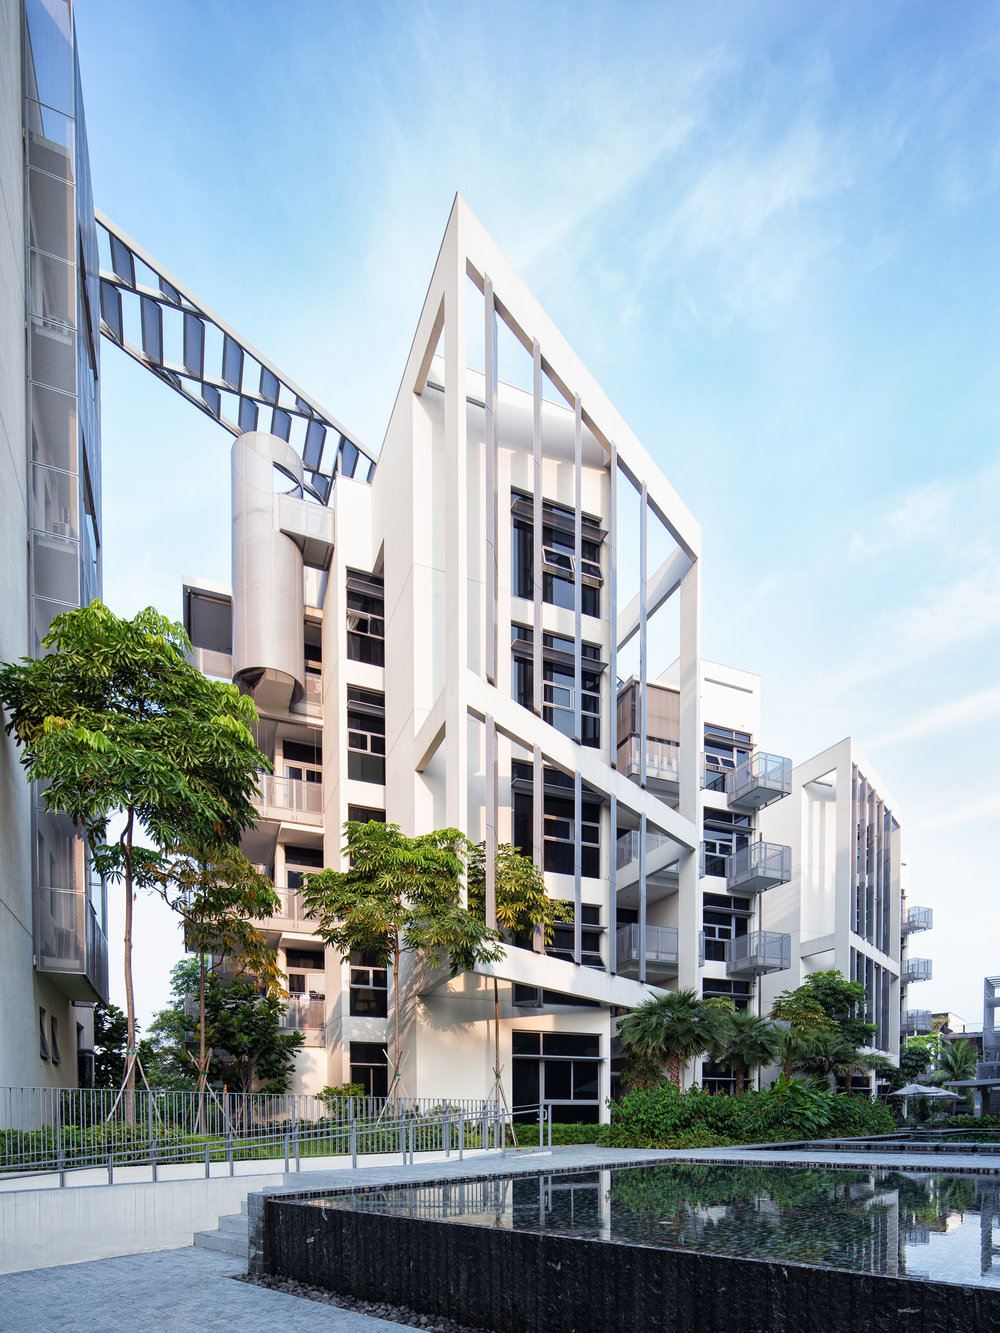 singapore-architectural-photographer-zainal-zainal-studio-look-architects-bliss-kovan-02.jpg